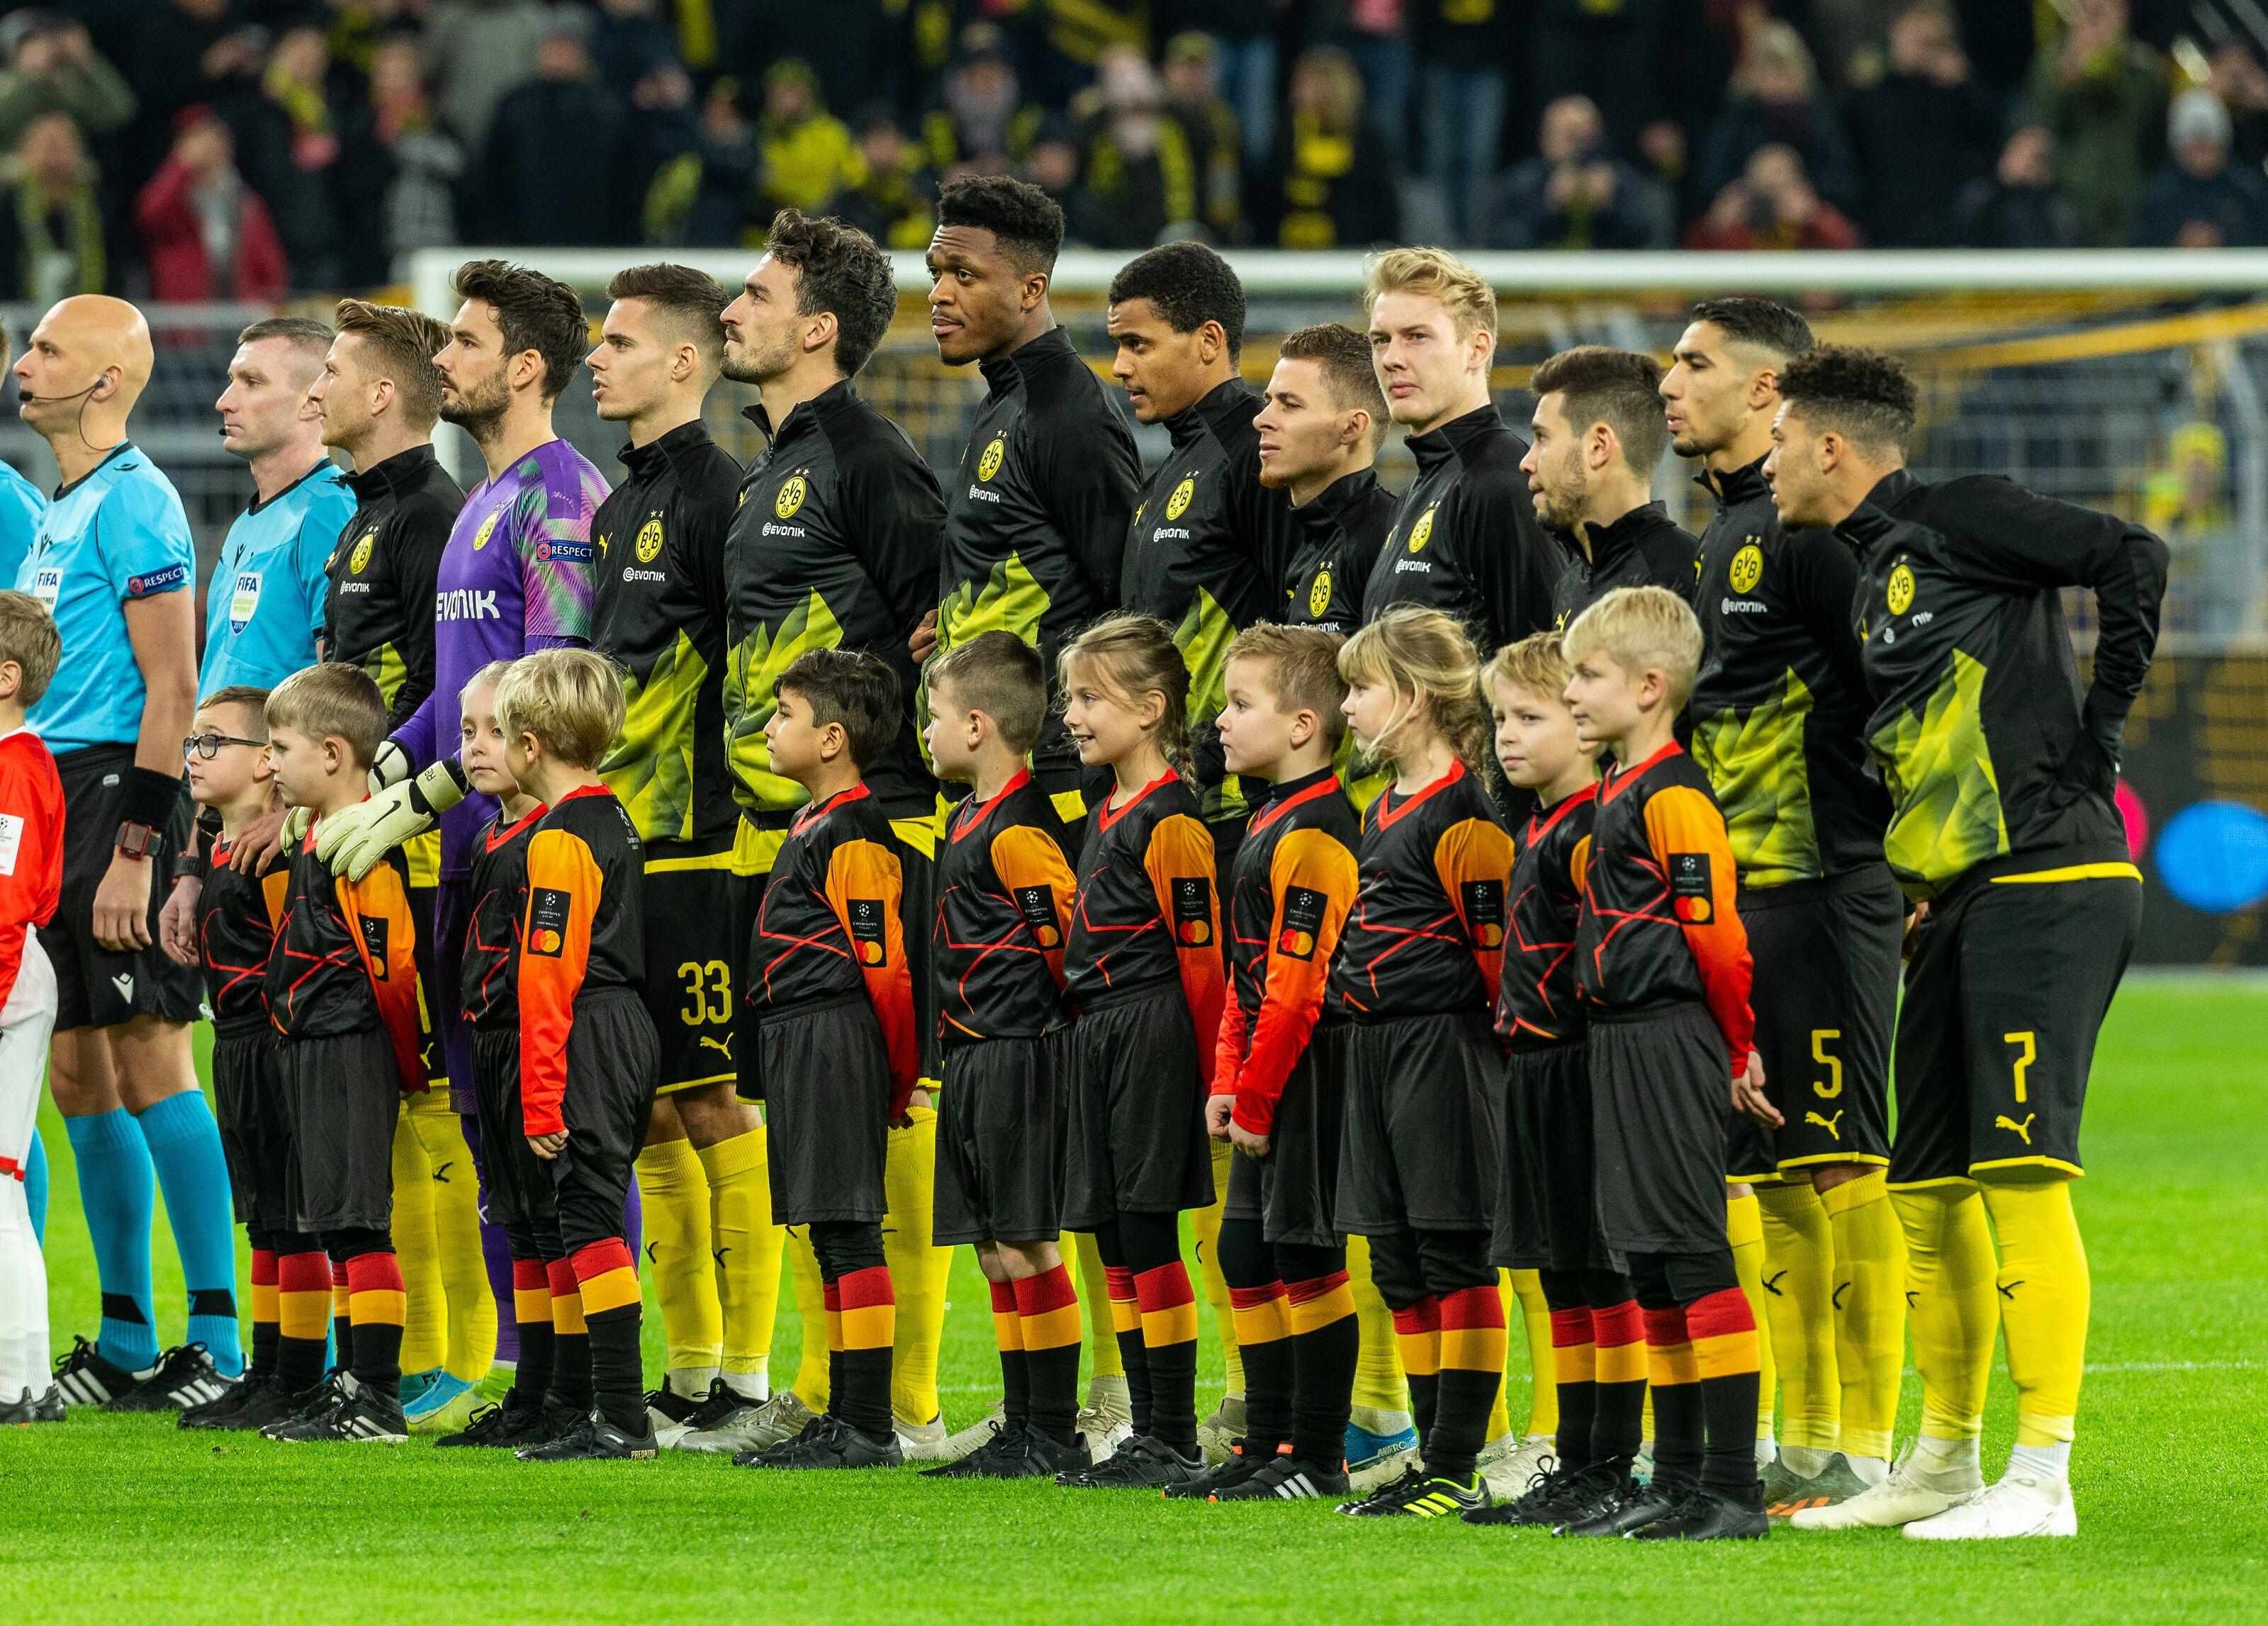 Watch Mainz vs Borussia Dortmund: Live Stream, TV Channel for Bundesliga clash